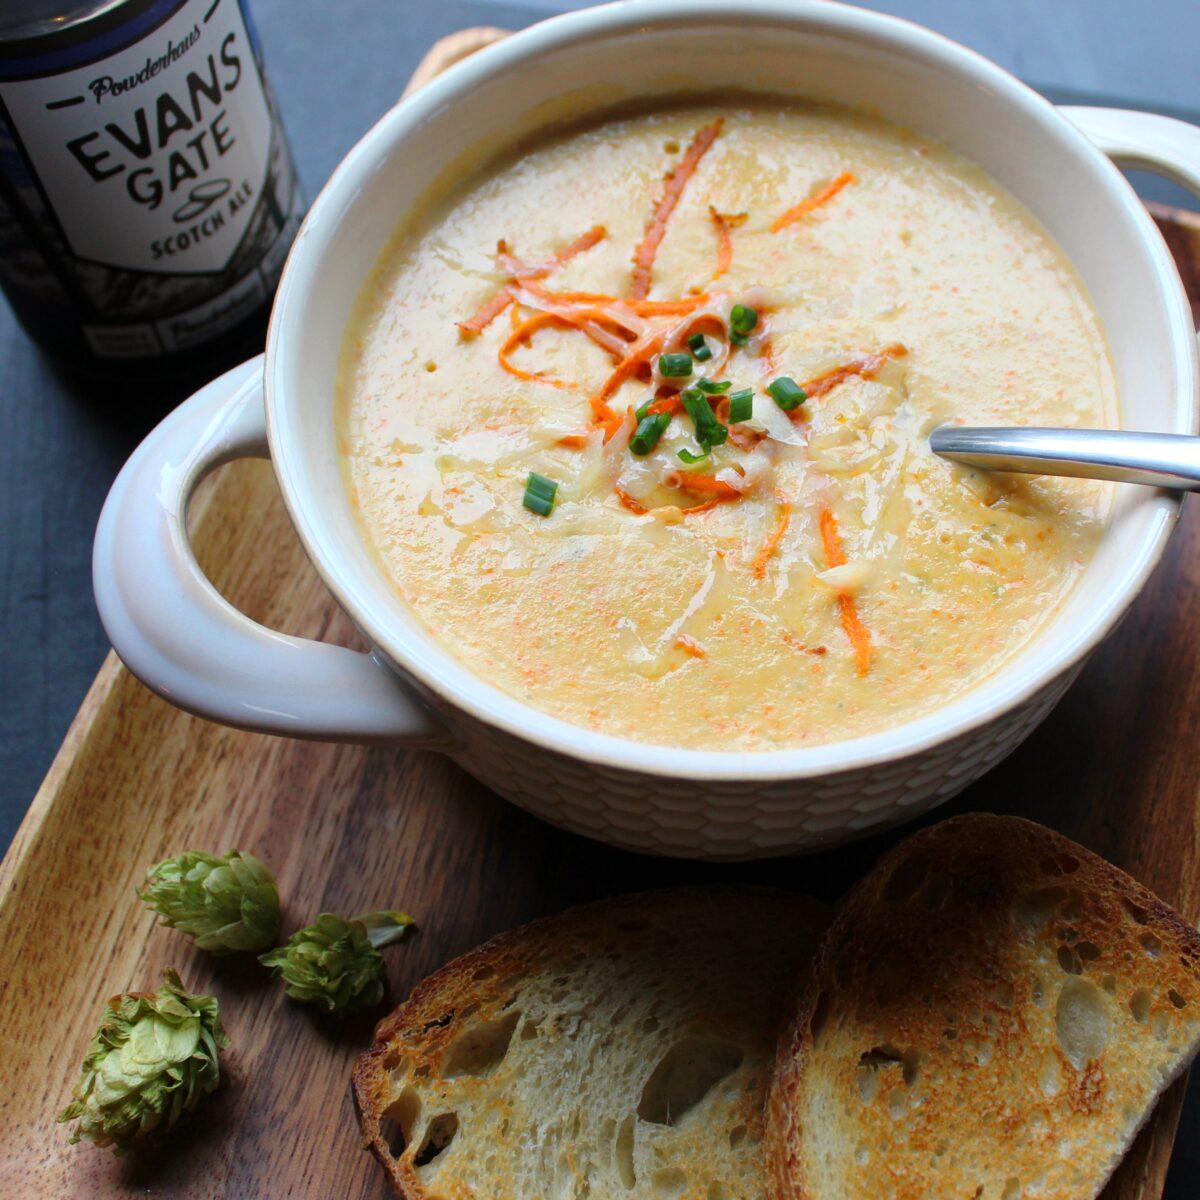 Jalapeño Beer Cheese Soup